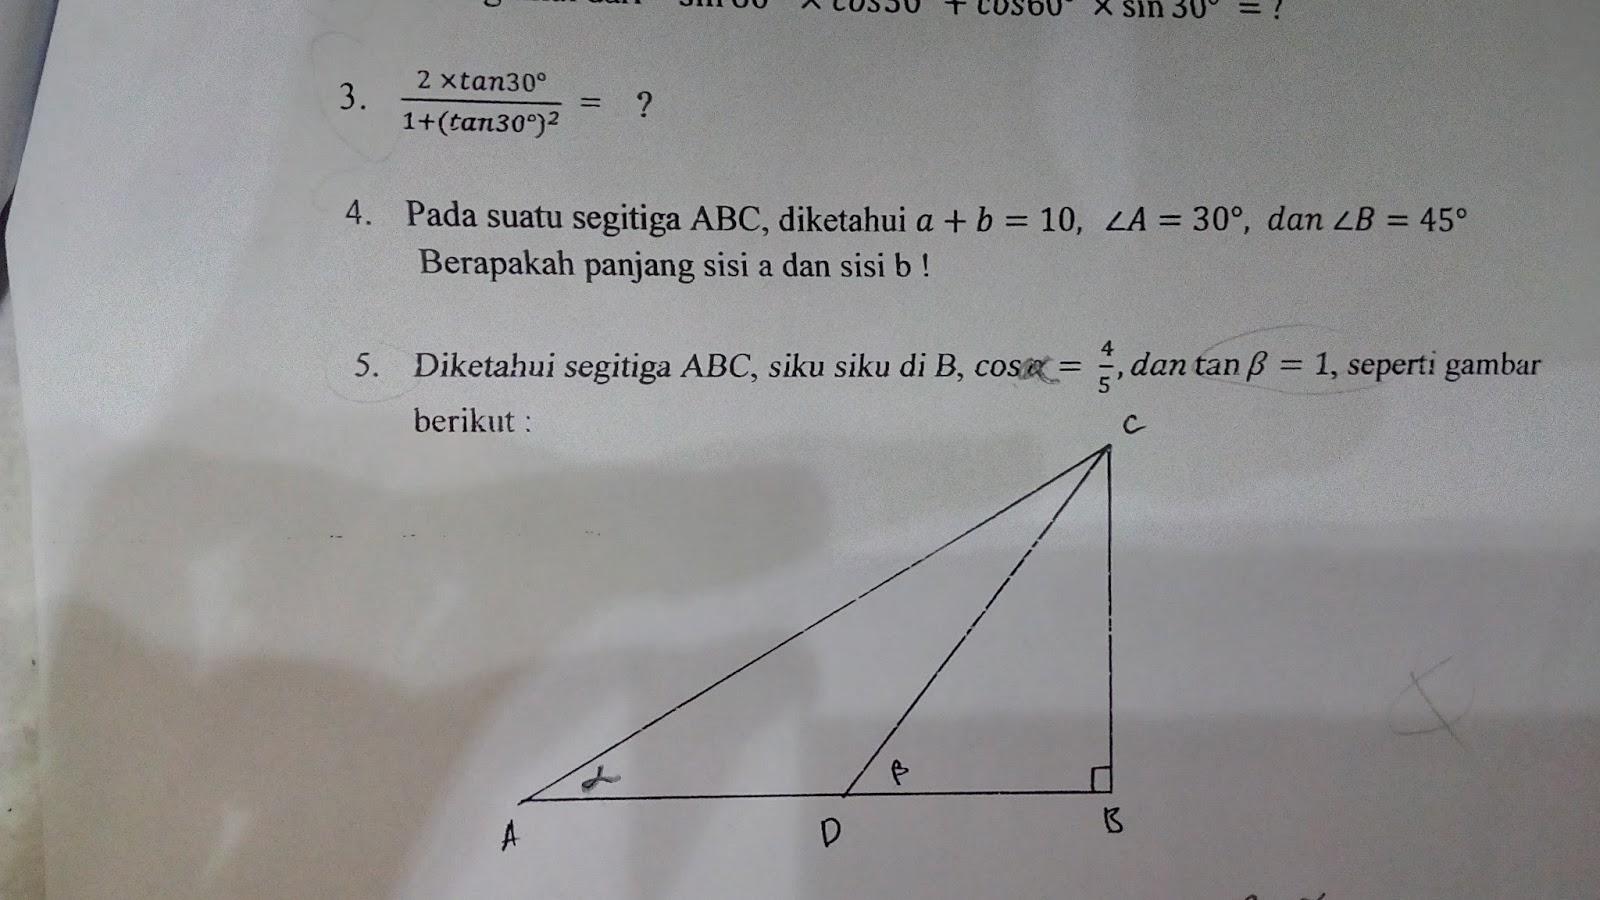 Soal Trigonometri Uts Kelas X Semester 2 Pg Berbagi Ilmu